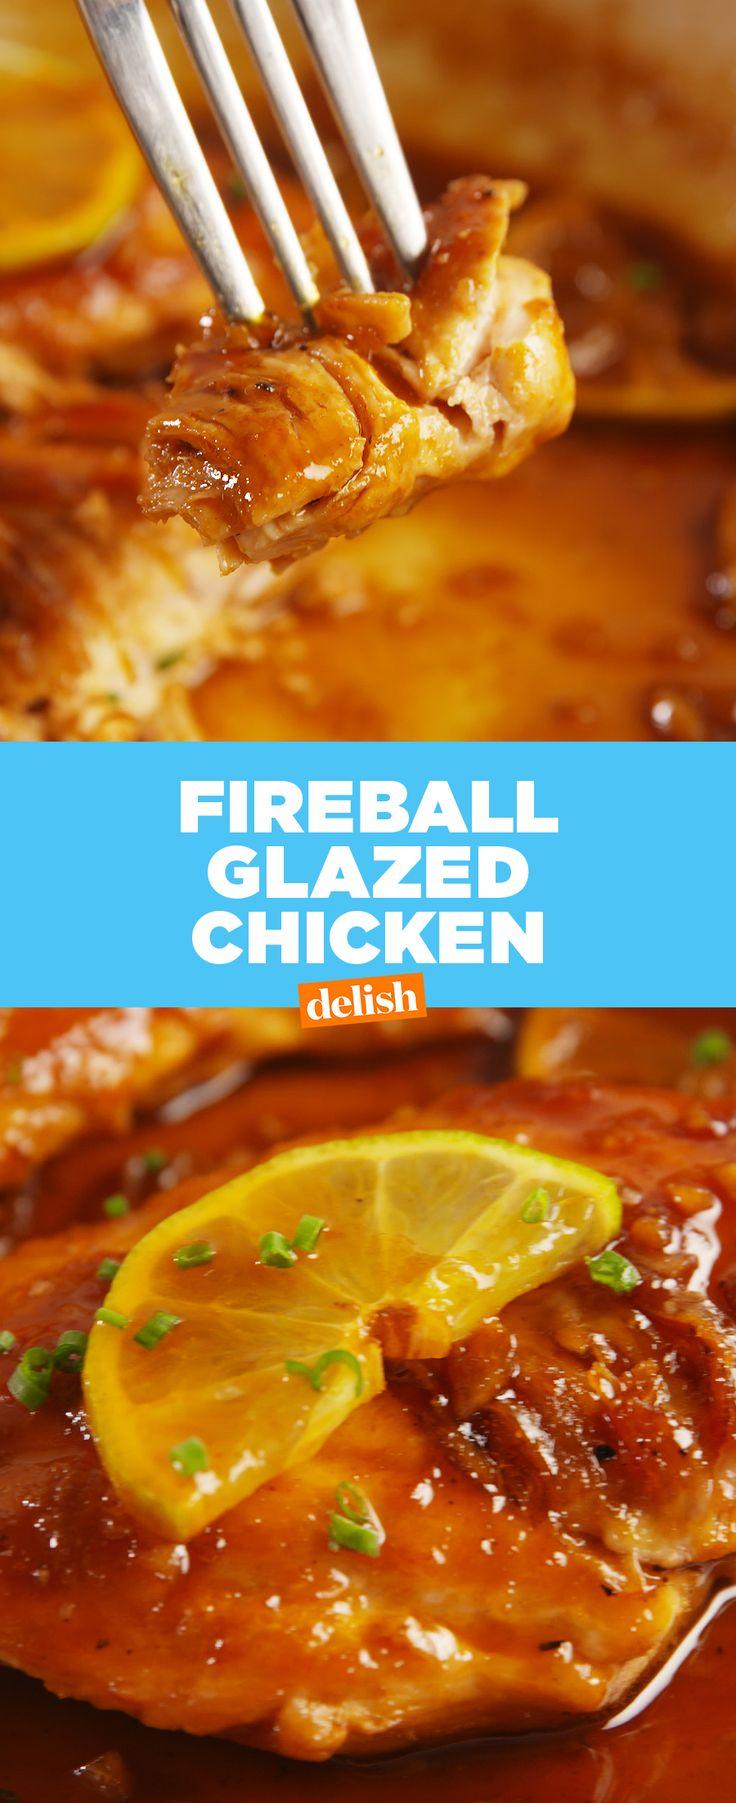 Fireball Glazed Chicken